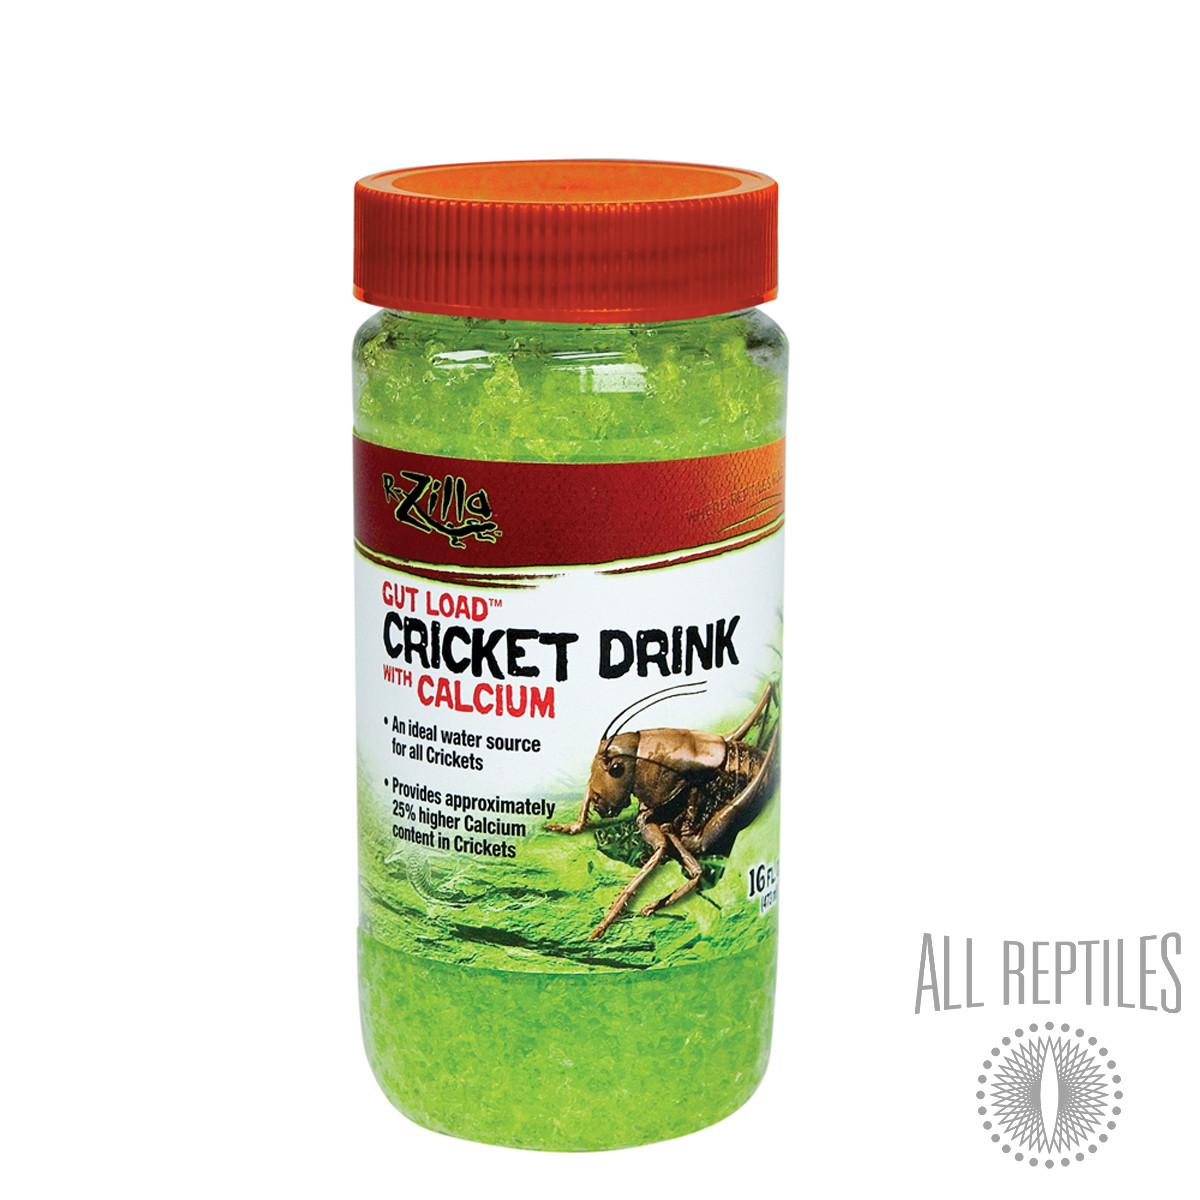 RZilla Cricket Drink with Calcium Gut Load